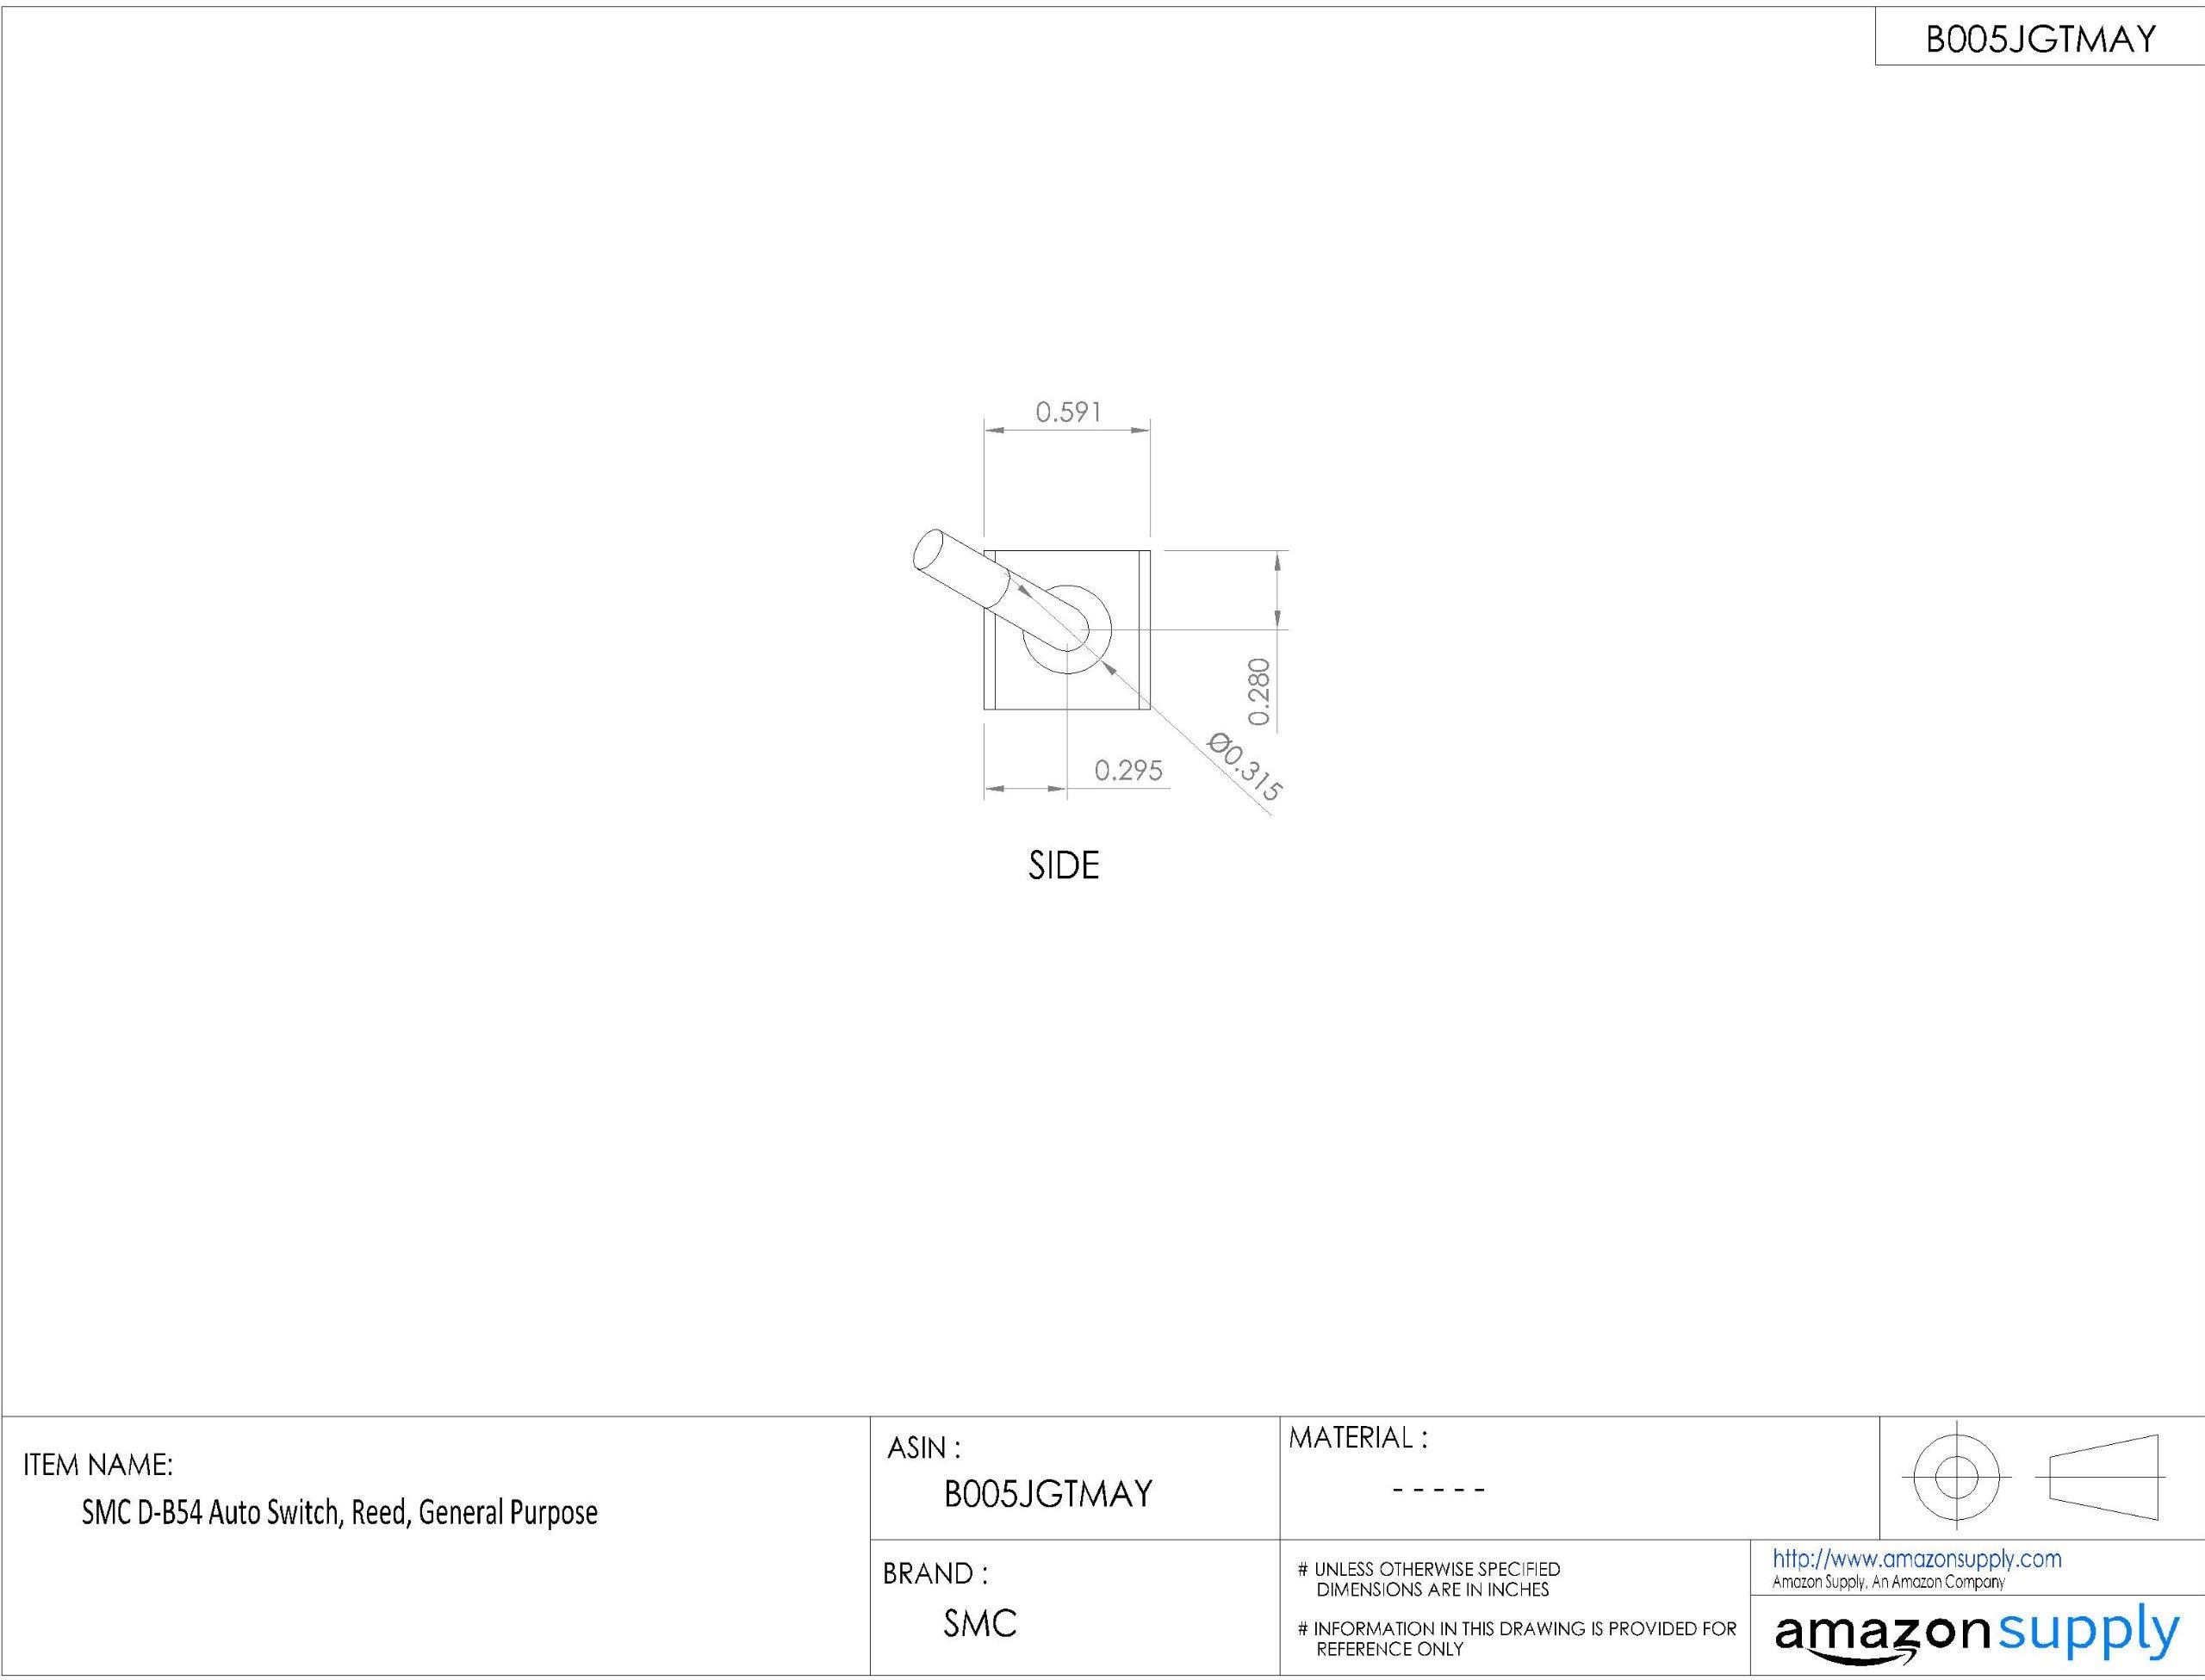 SMC D-B54 Auto Switch, Reed, General Purpose